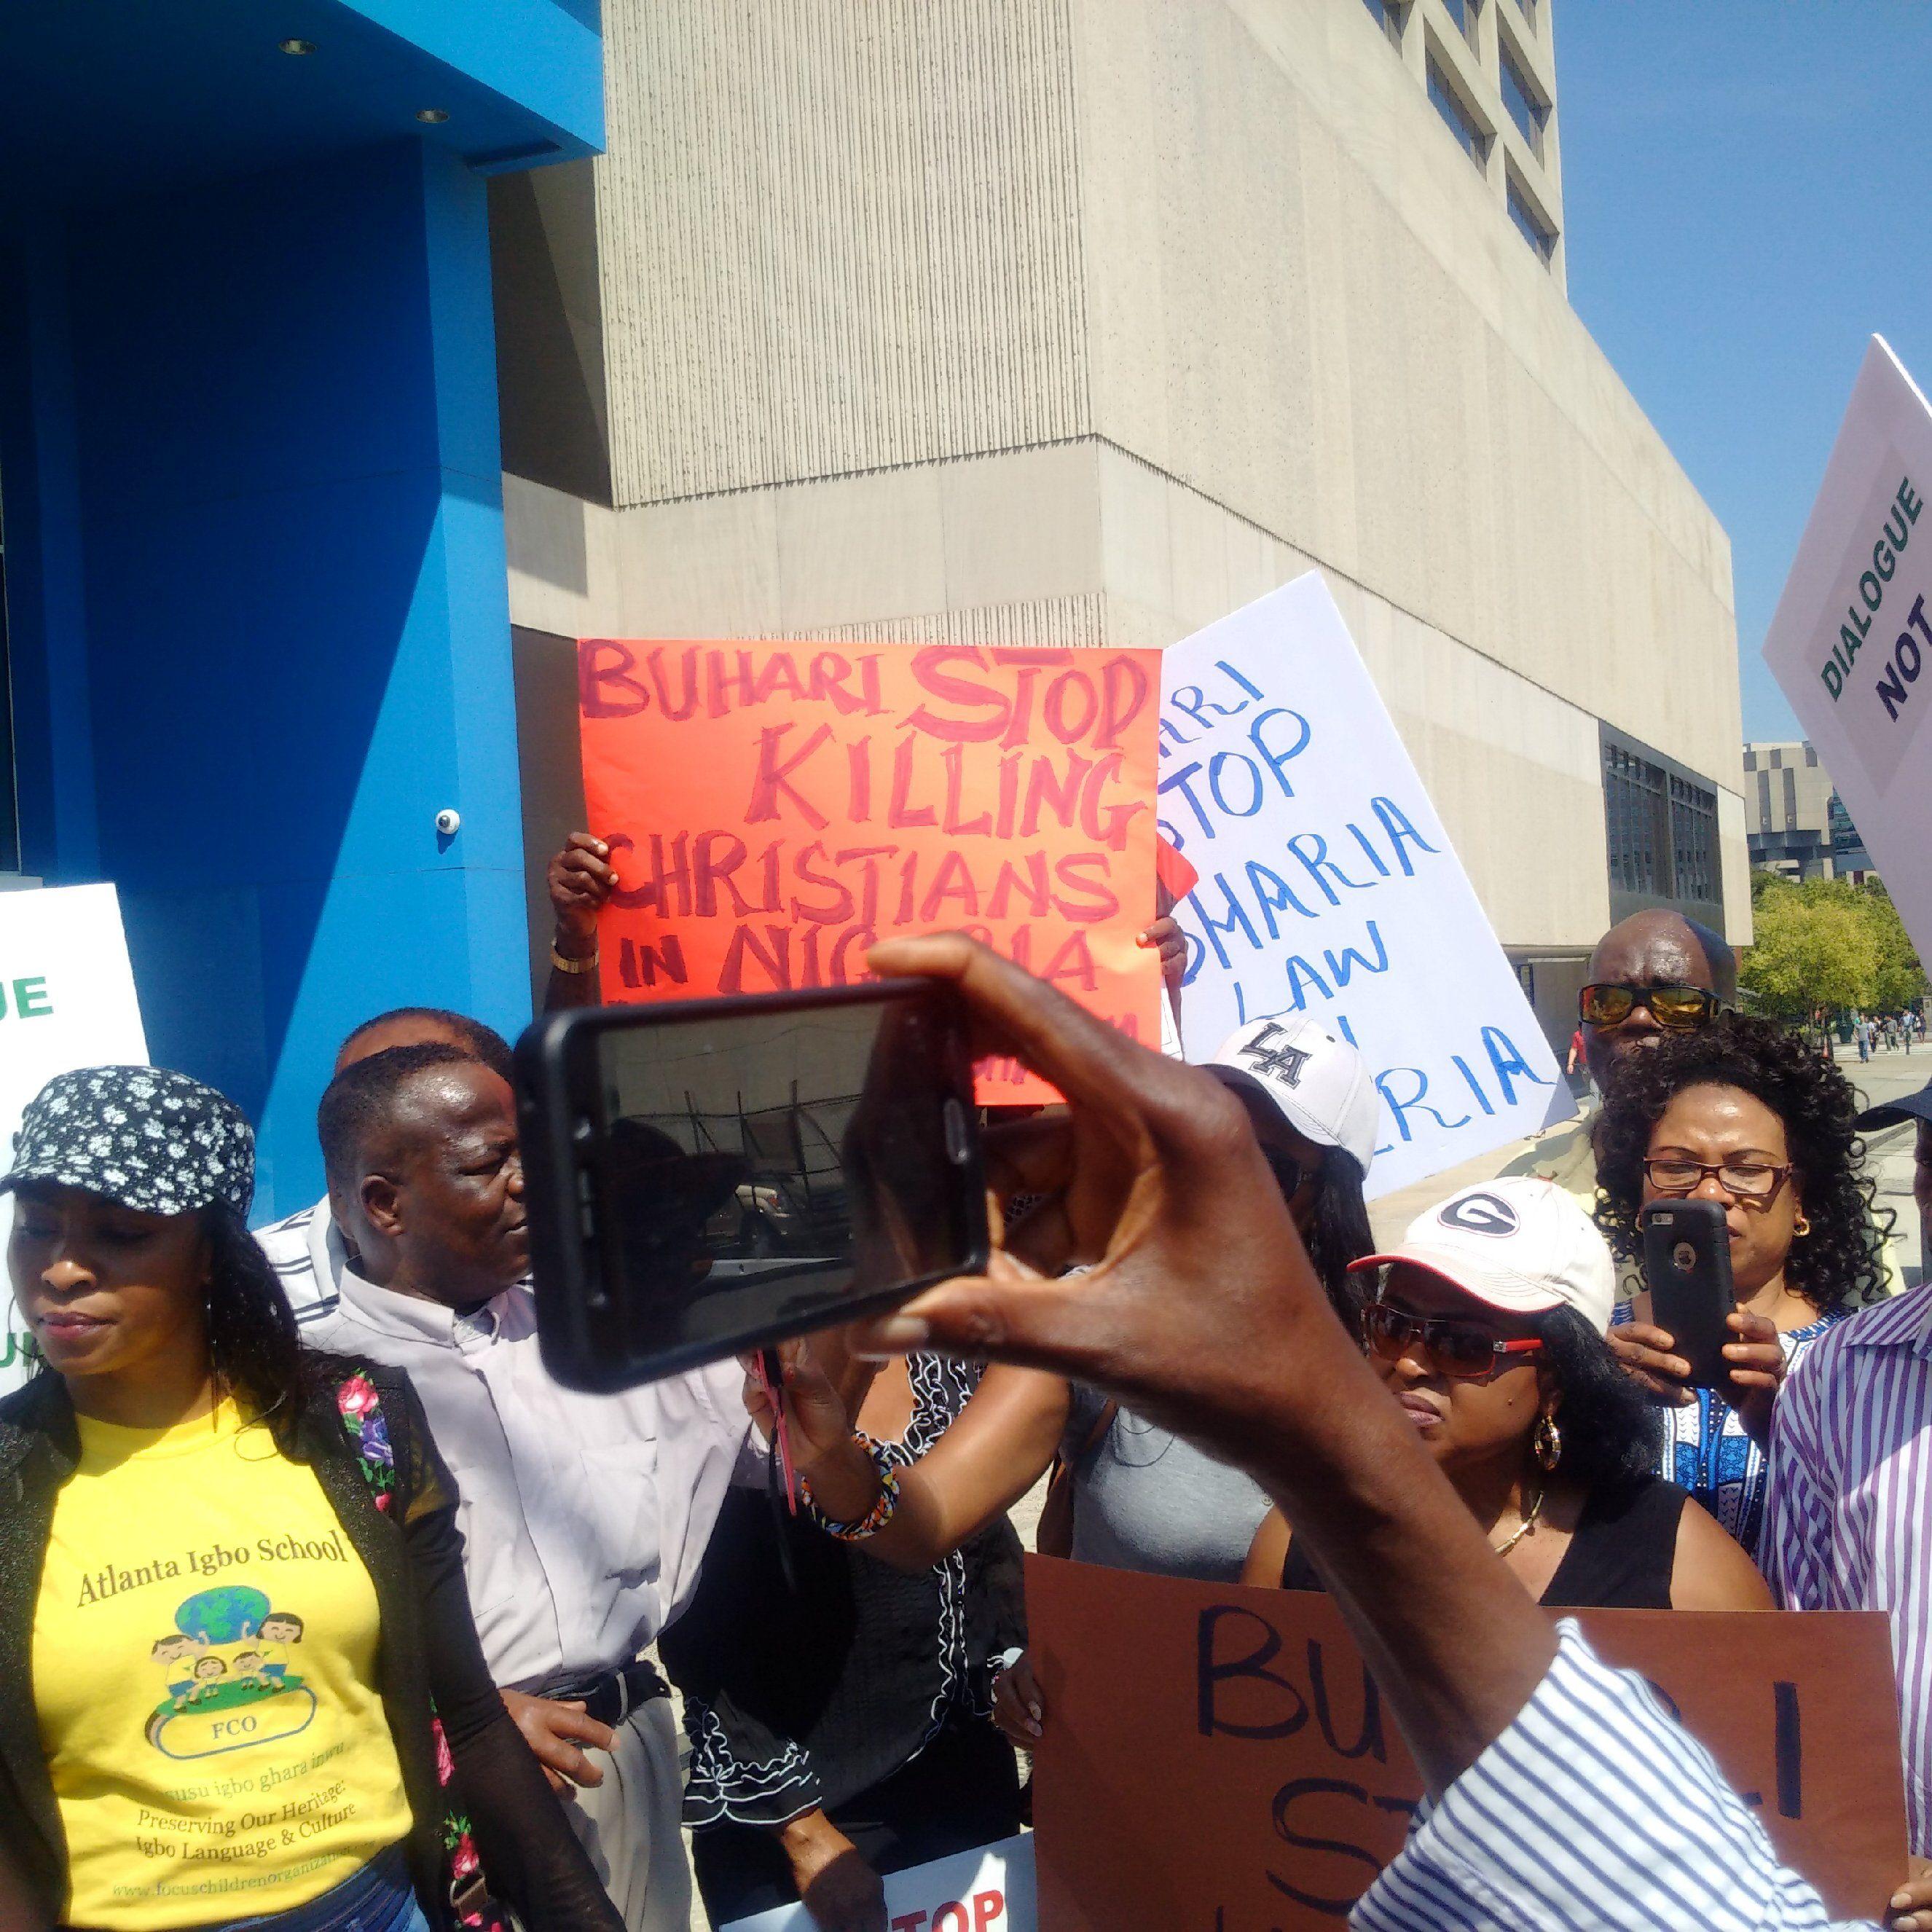 Pin On Nigerians Rally In Atlanta Against Killing Of Christians In Nigeria